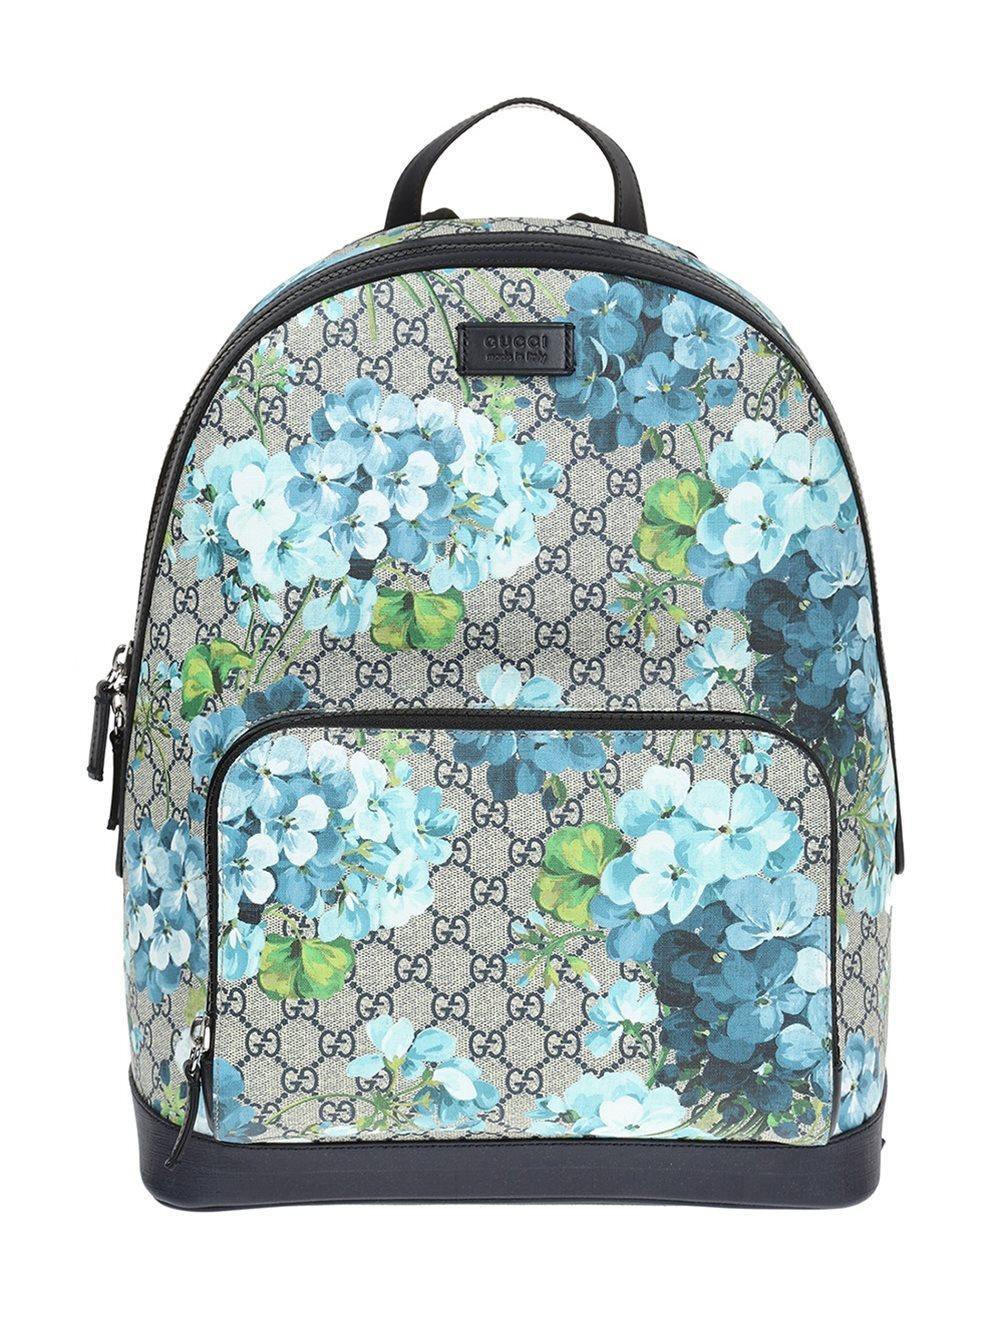 dda591d101f Lyst - Gucci Gg Blooms Backpack